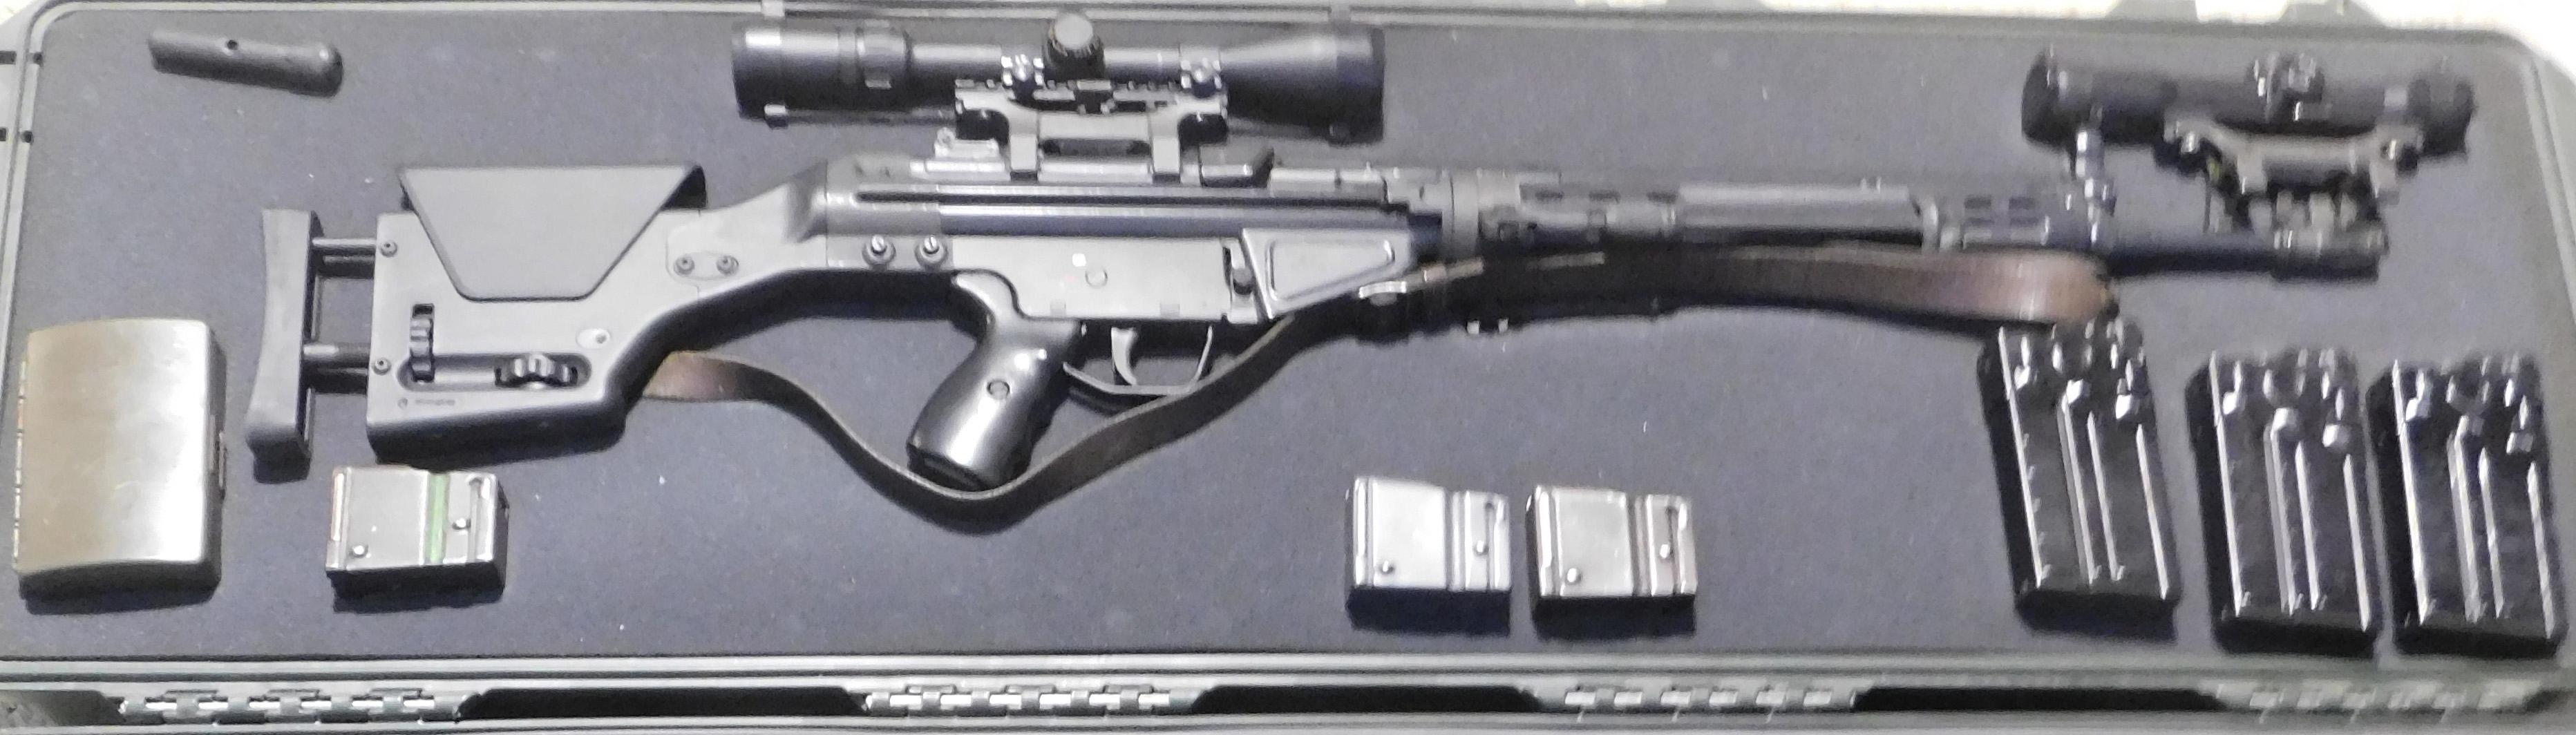 Participant Equipment List-msg90-1.jpg